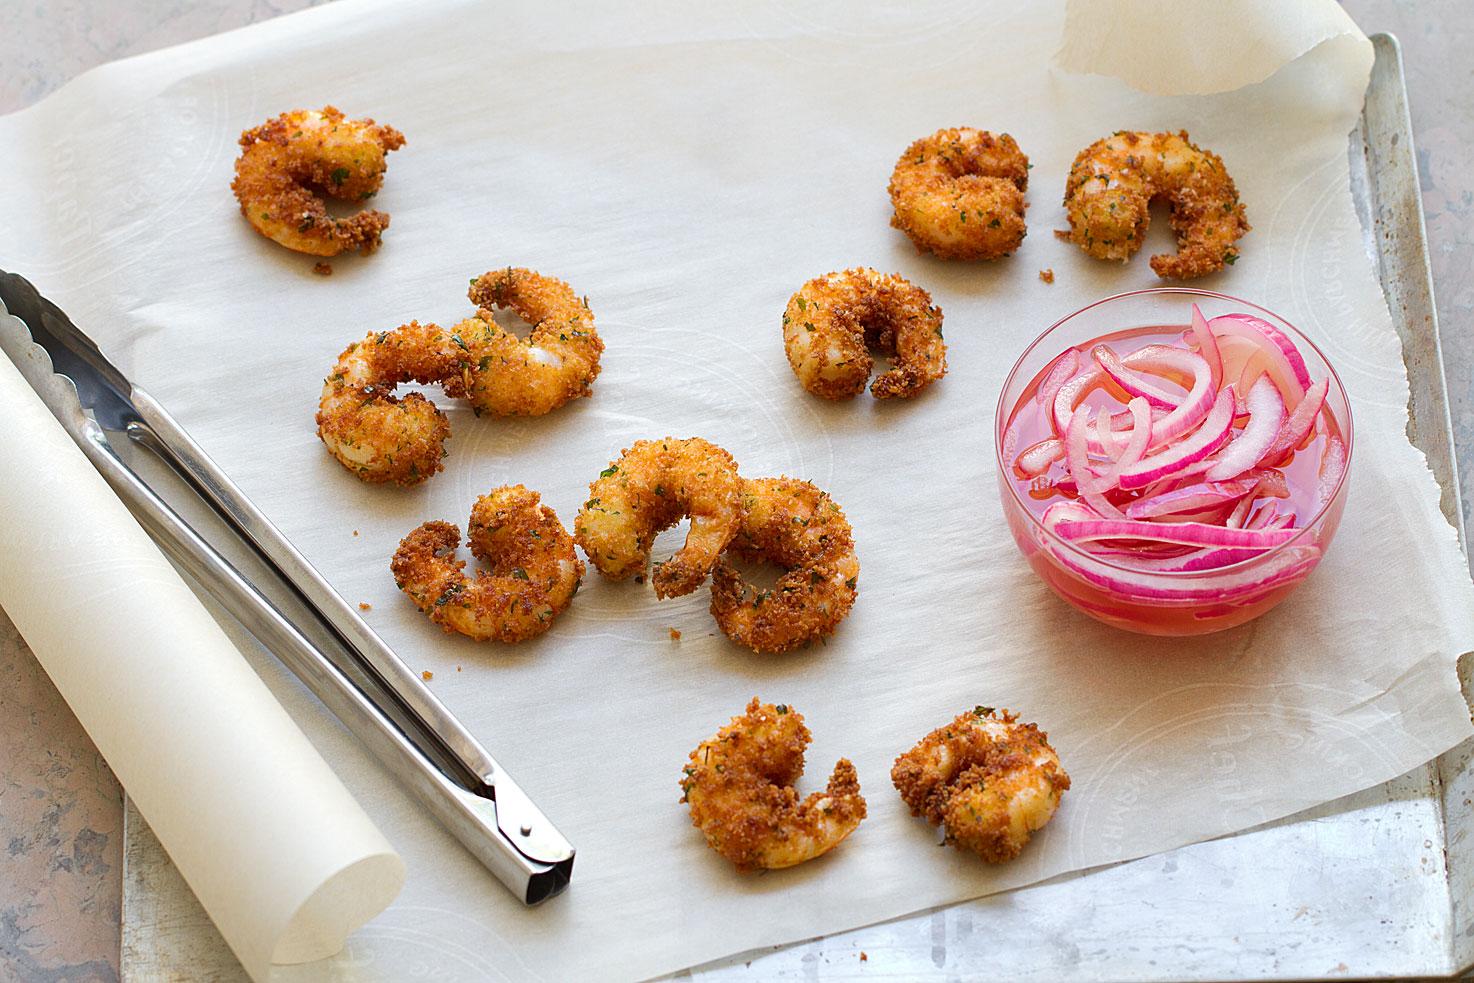 Panko Fried Shrimp for Spicy Shrimp Roll